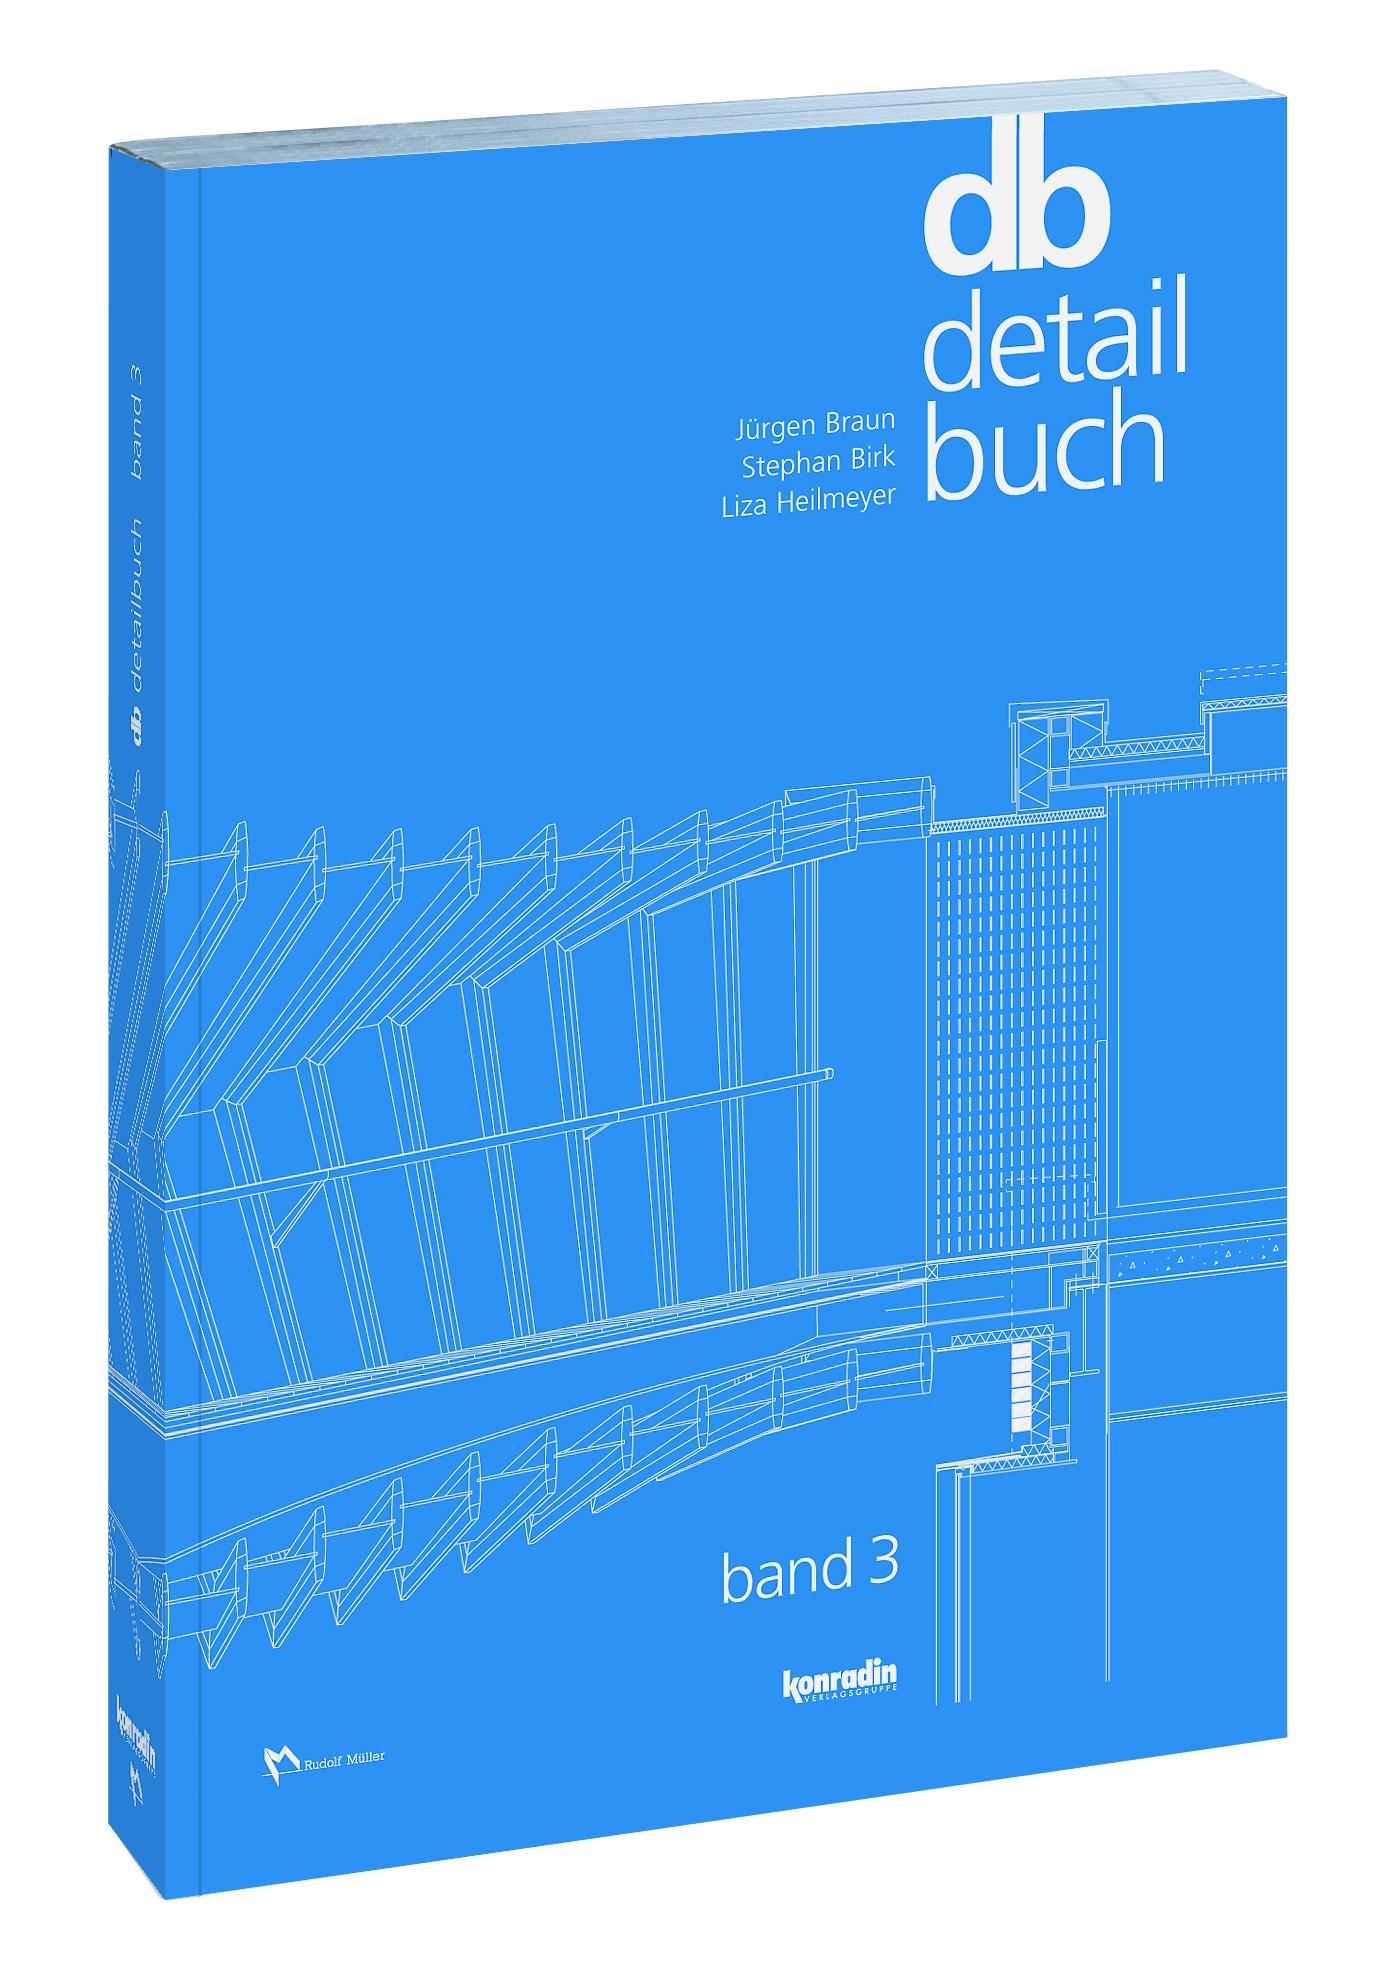 Jürgen Braun / db Detailbuch 3 9783481022402